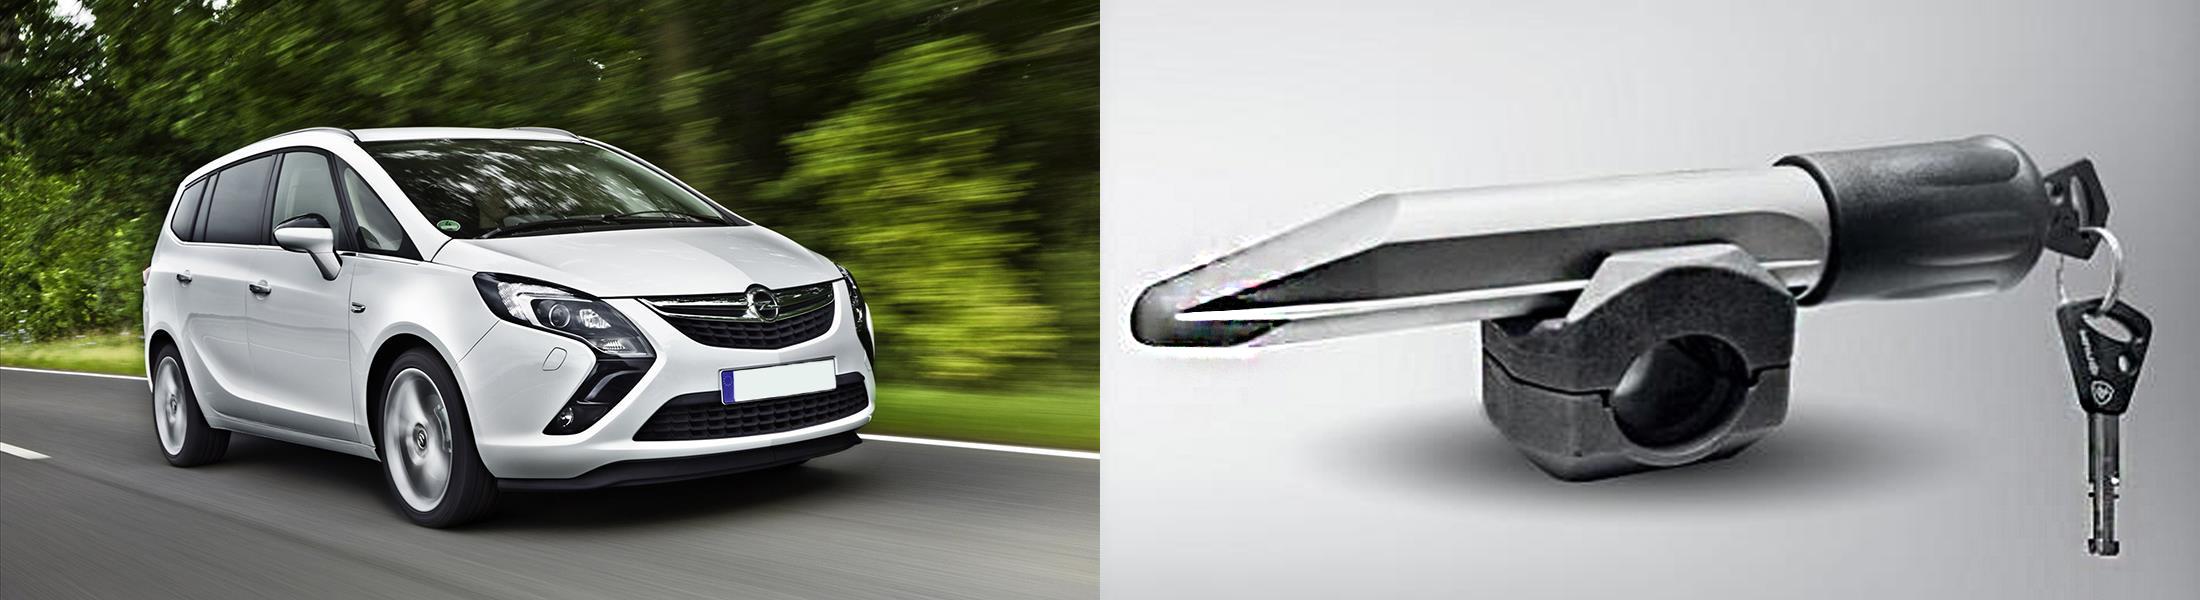 Opel Zafira Tourer /2012-/, Гарант Блок Люкс 617.E